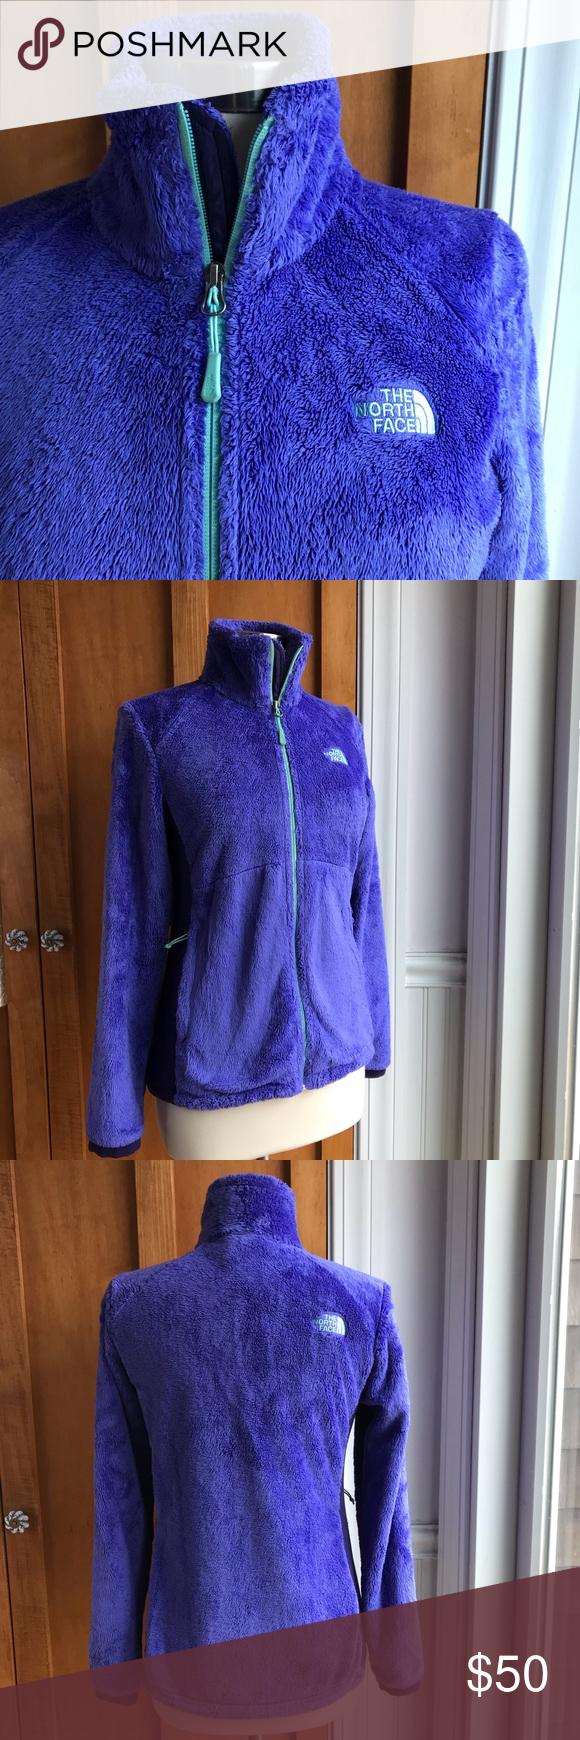 The North Face Purple Osito Fleece Jacket Fleece Jacket Clothes Design North Face Jacket [ 1740 x 580 Pixel ]